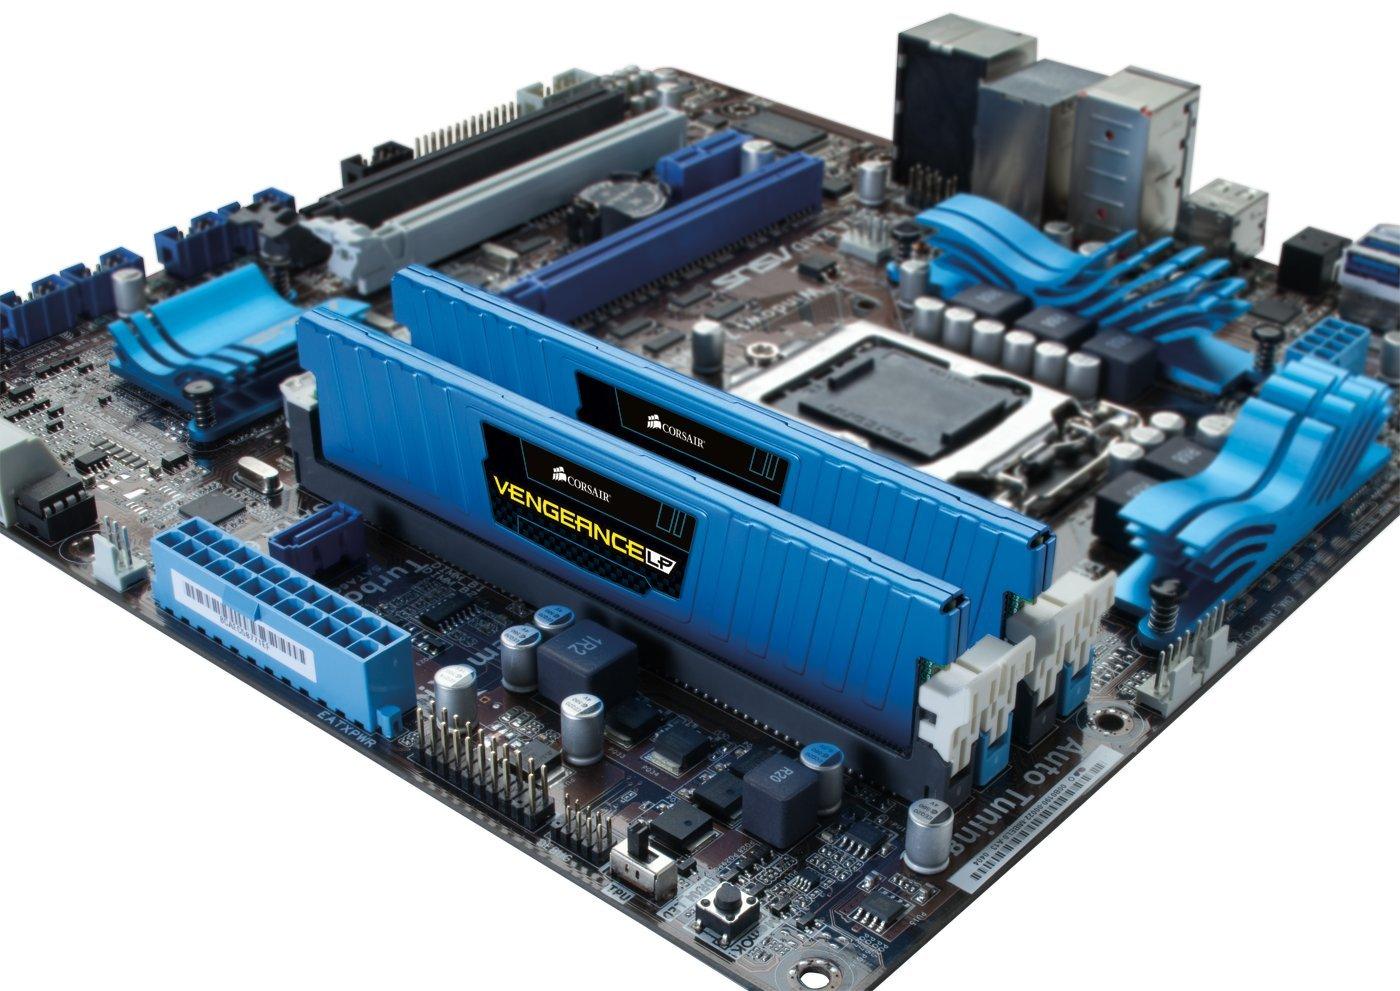 Corsair Vengeance LP Blue 16 GB (2x8 GB) DDR3 1600MHz (PC3 12800) Desktop Memory 1.5V